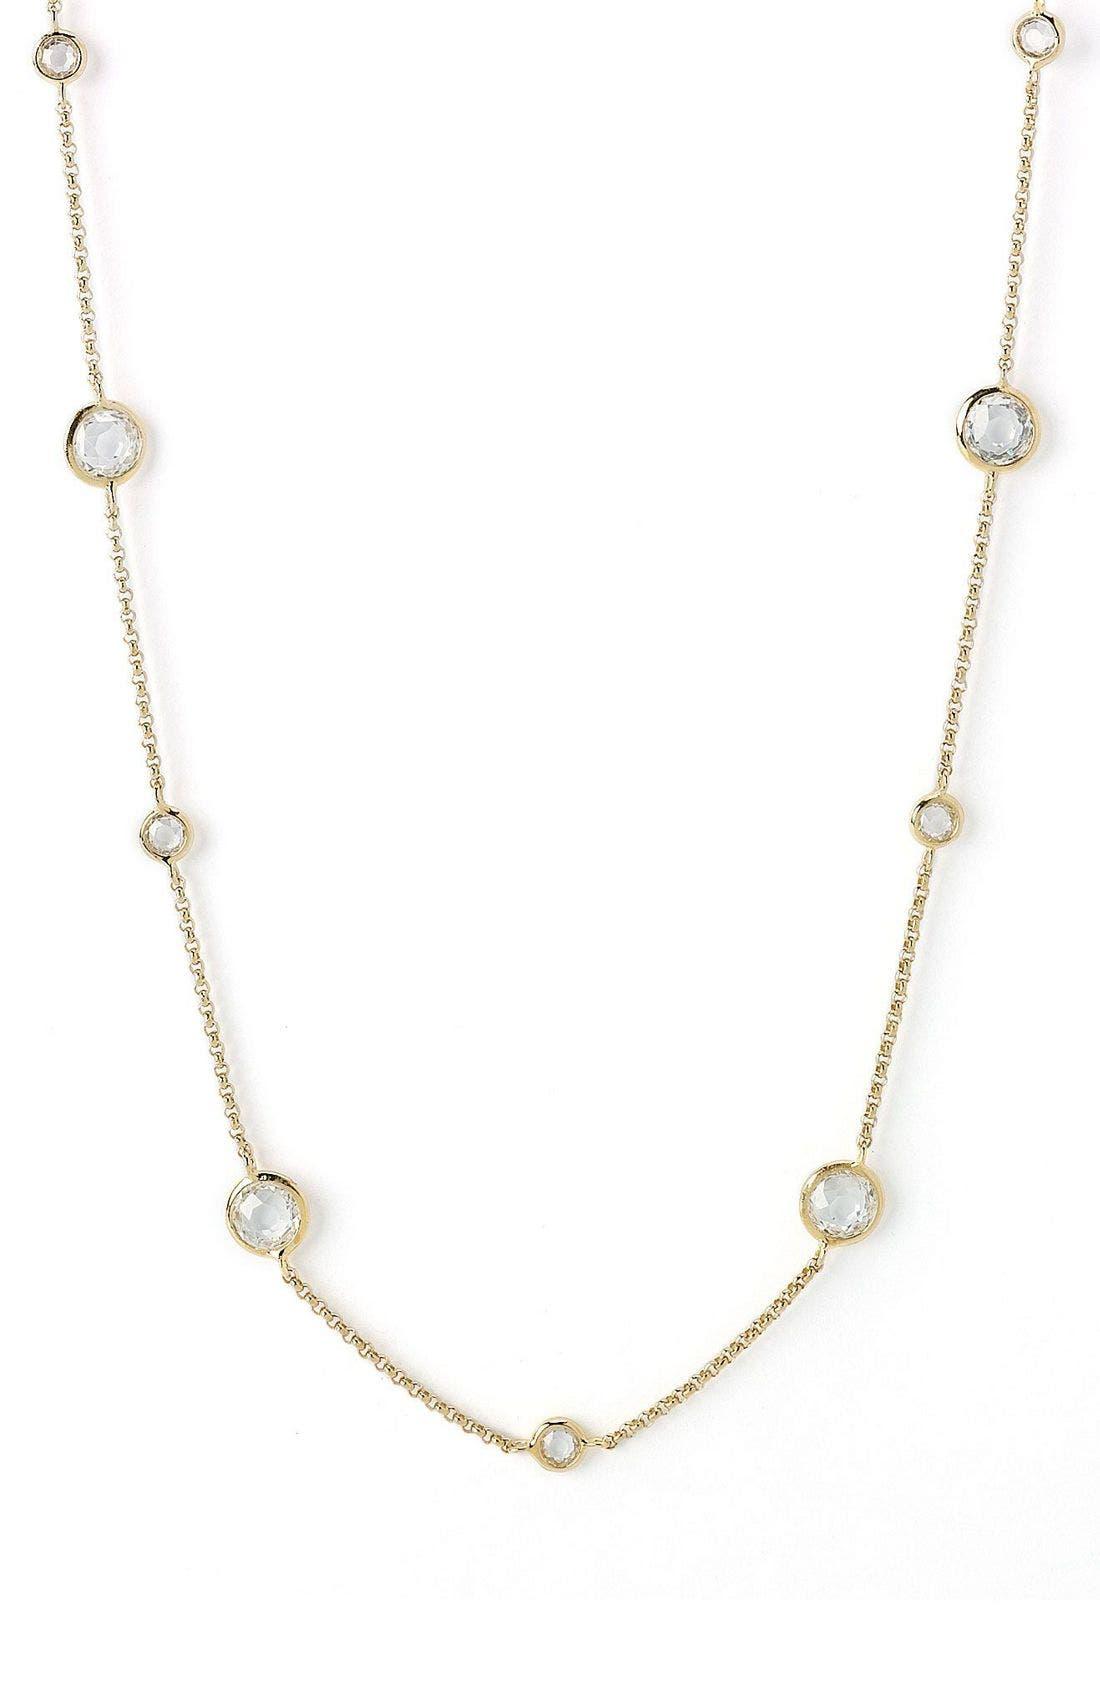 Main Image - Nadri Long Strand All Around Bezel Necklace